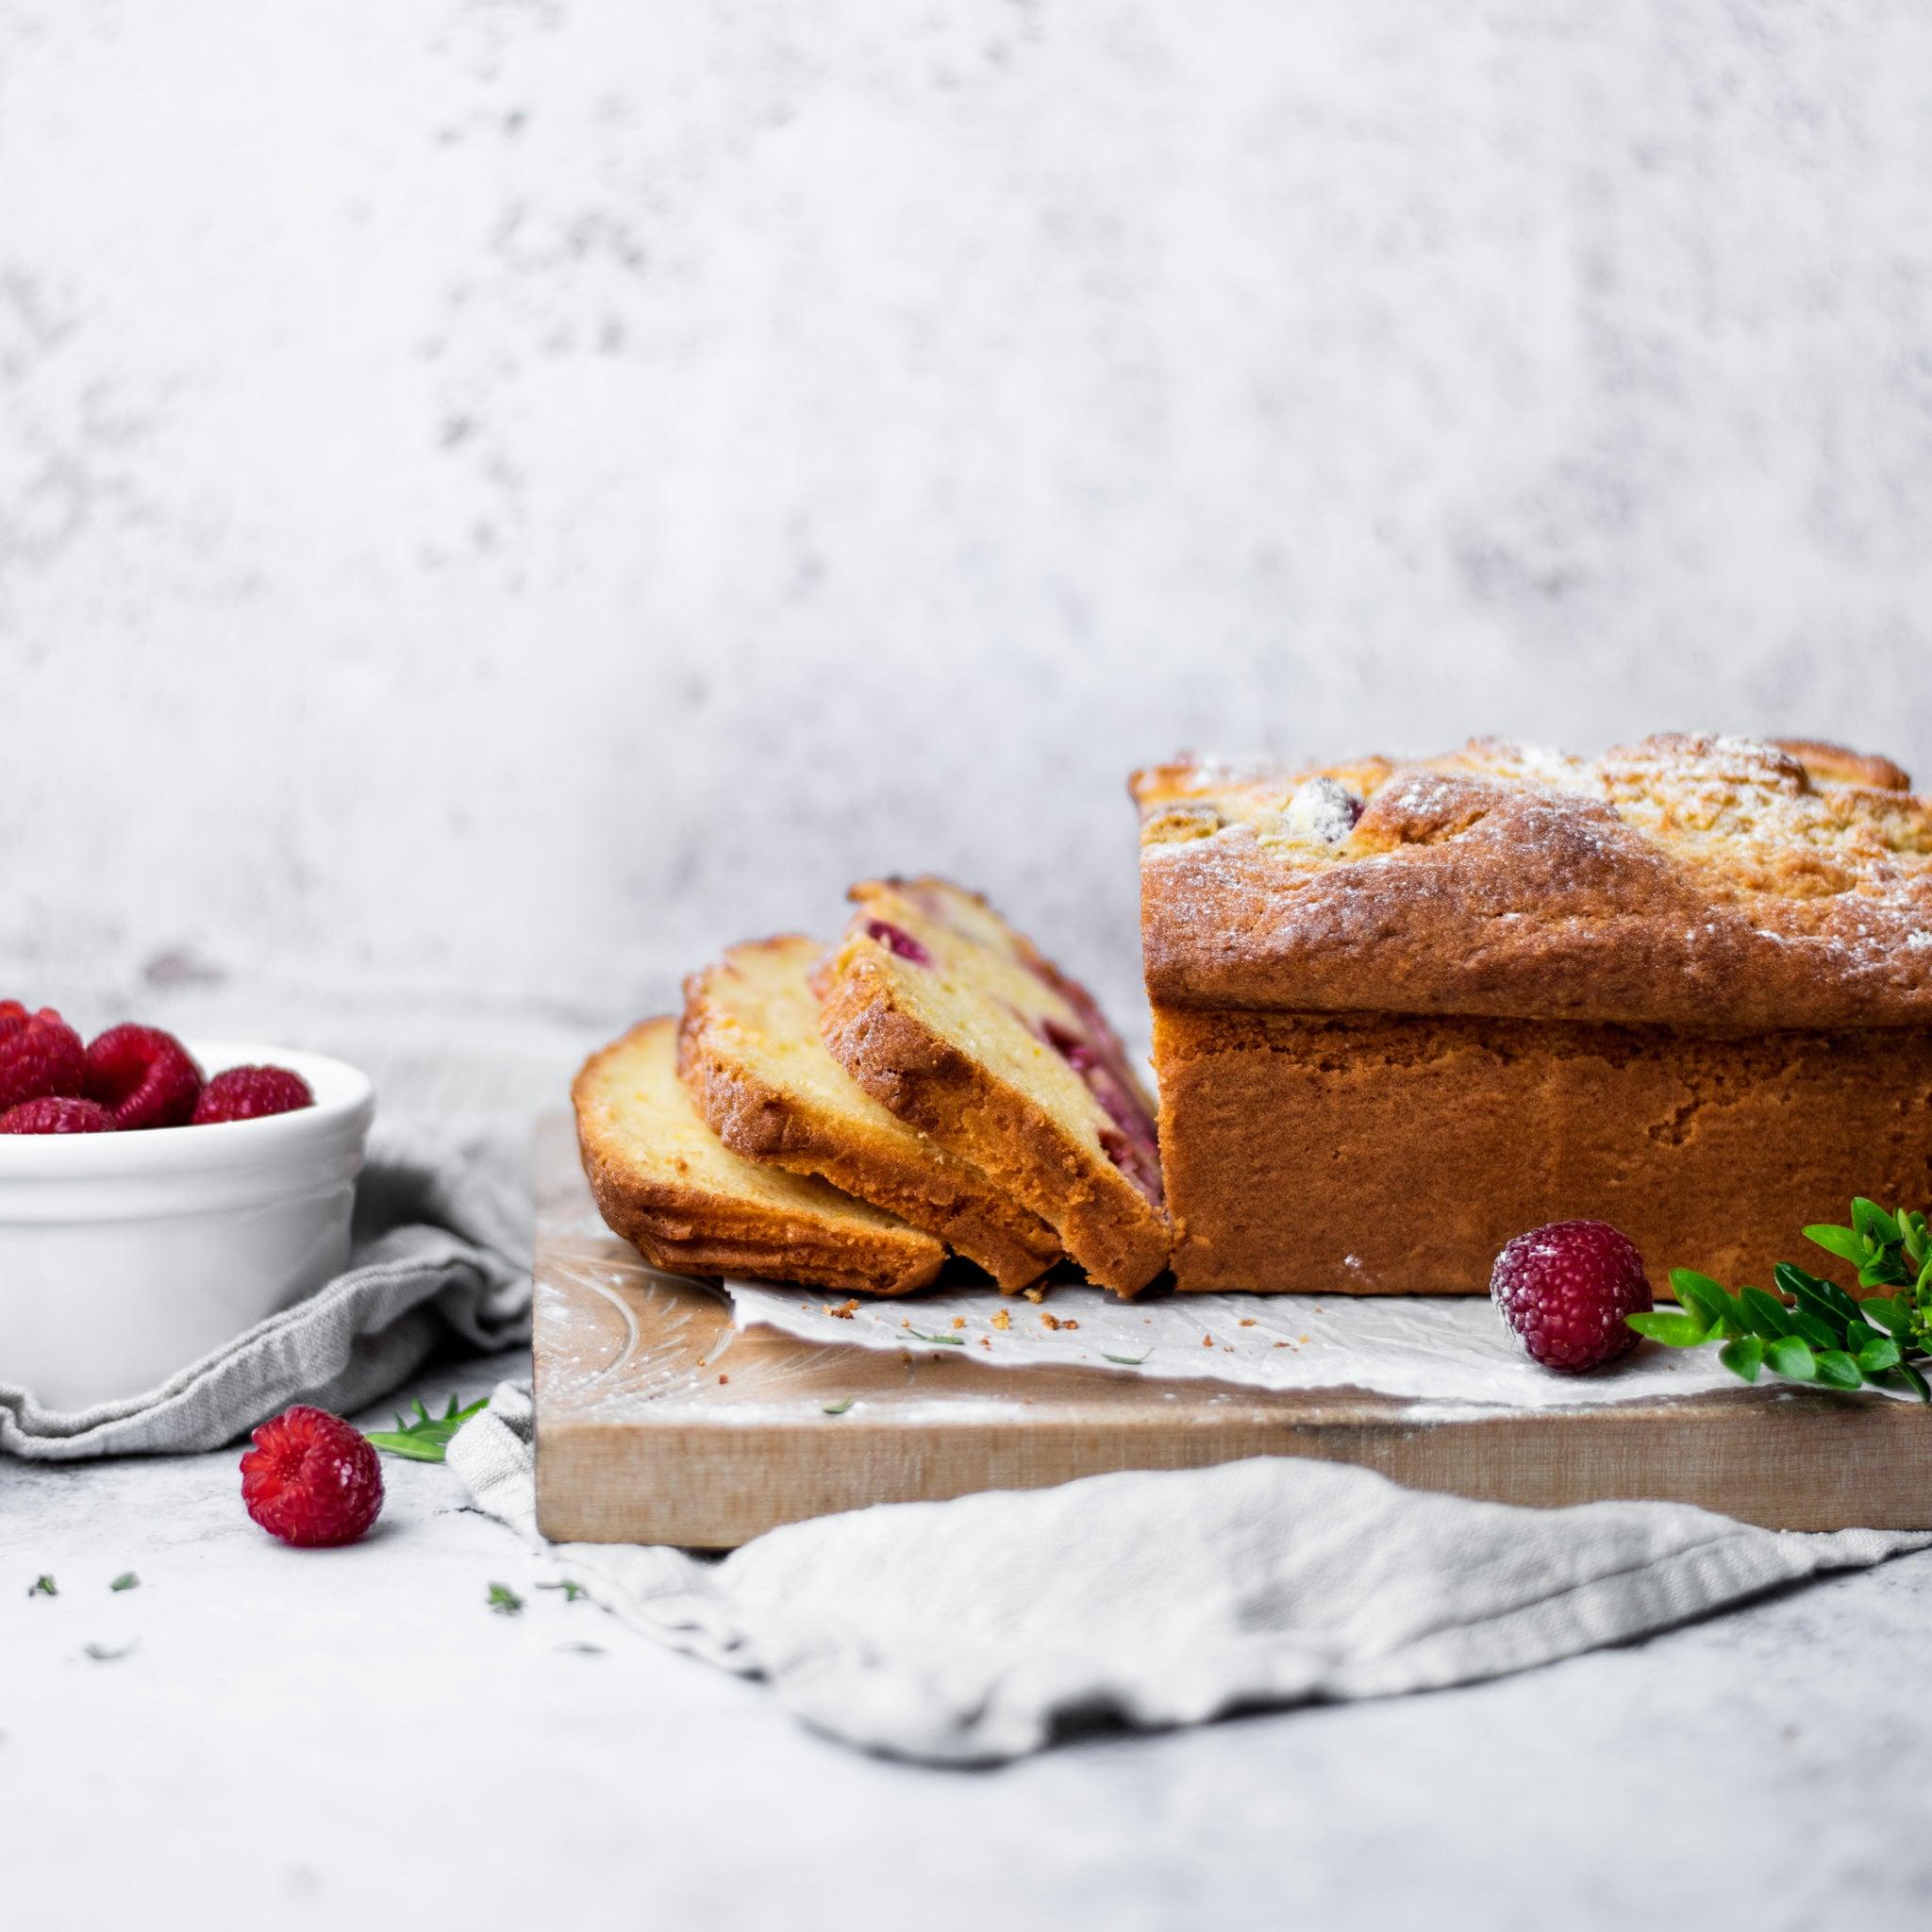 Allinsons-Orange-Raspberry-Loaf-Cake-1-1-Baking-Mad-4.jpg